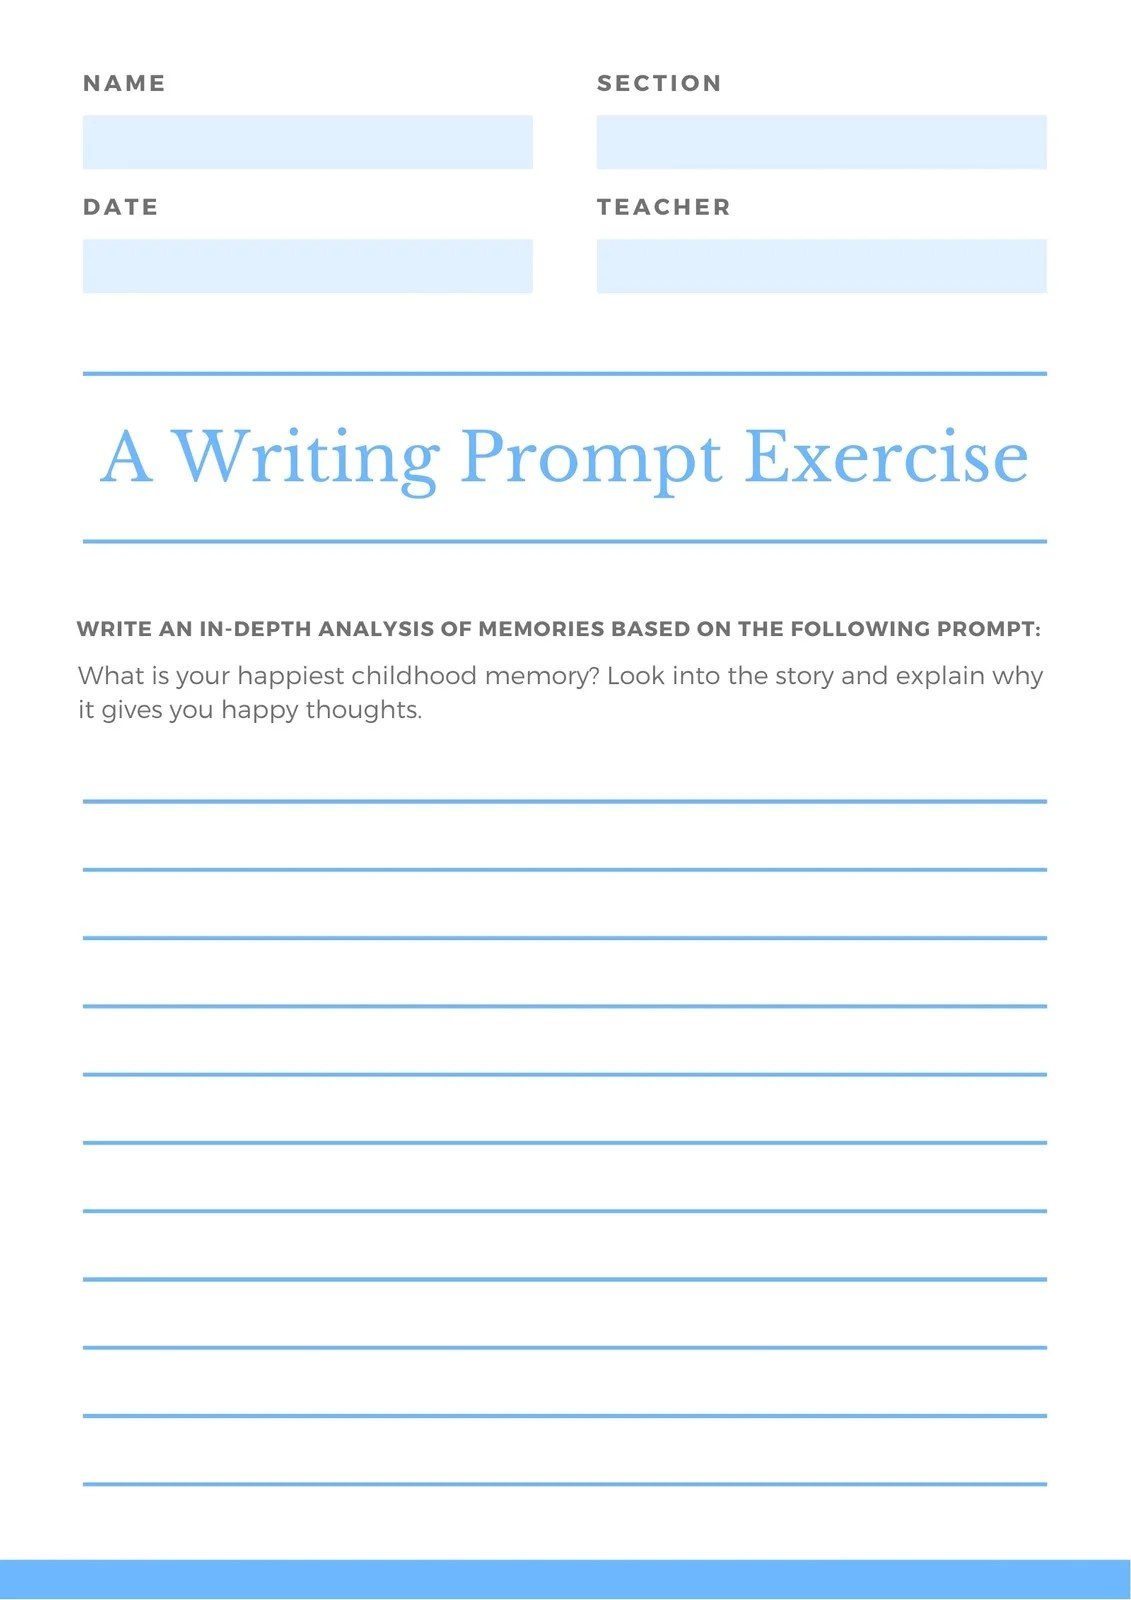 White And Blue Minimal Writing Promptysis Worksheet